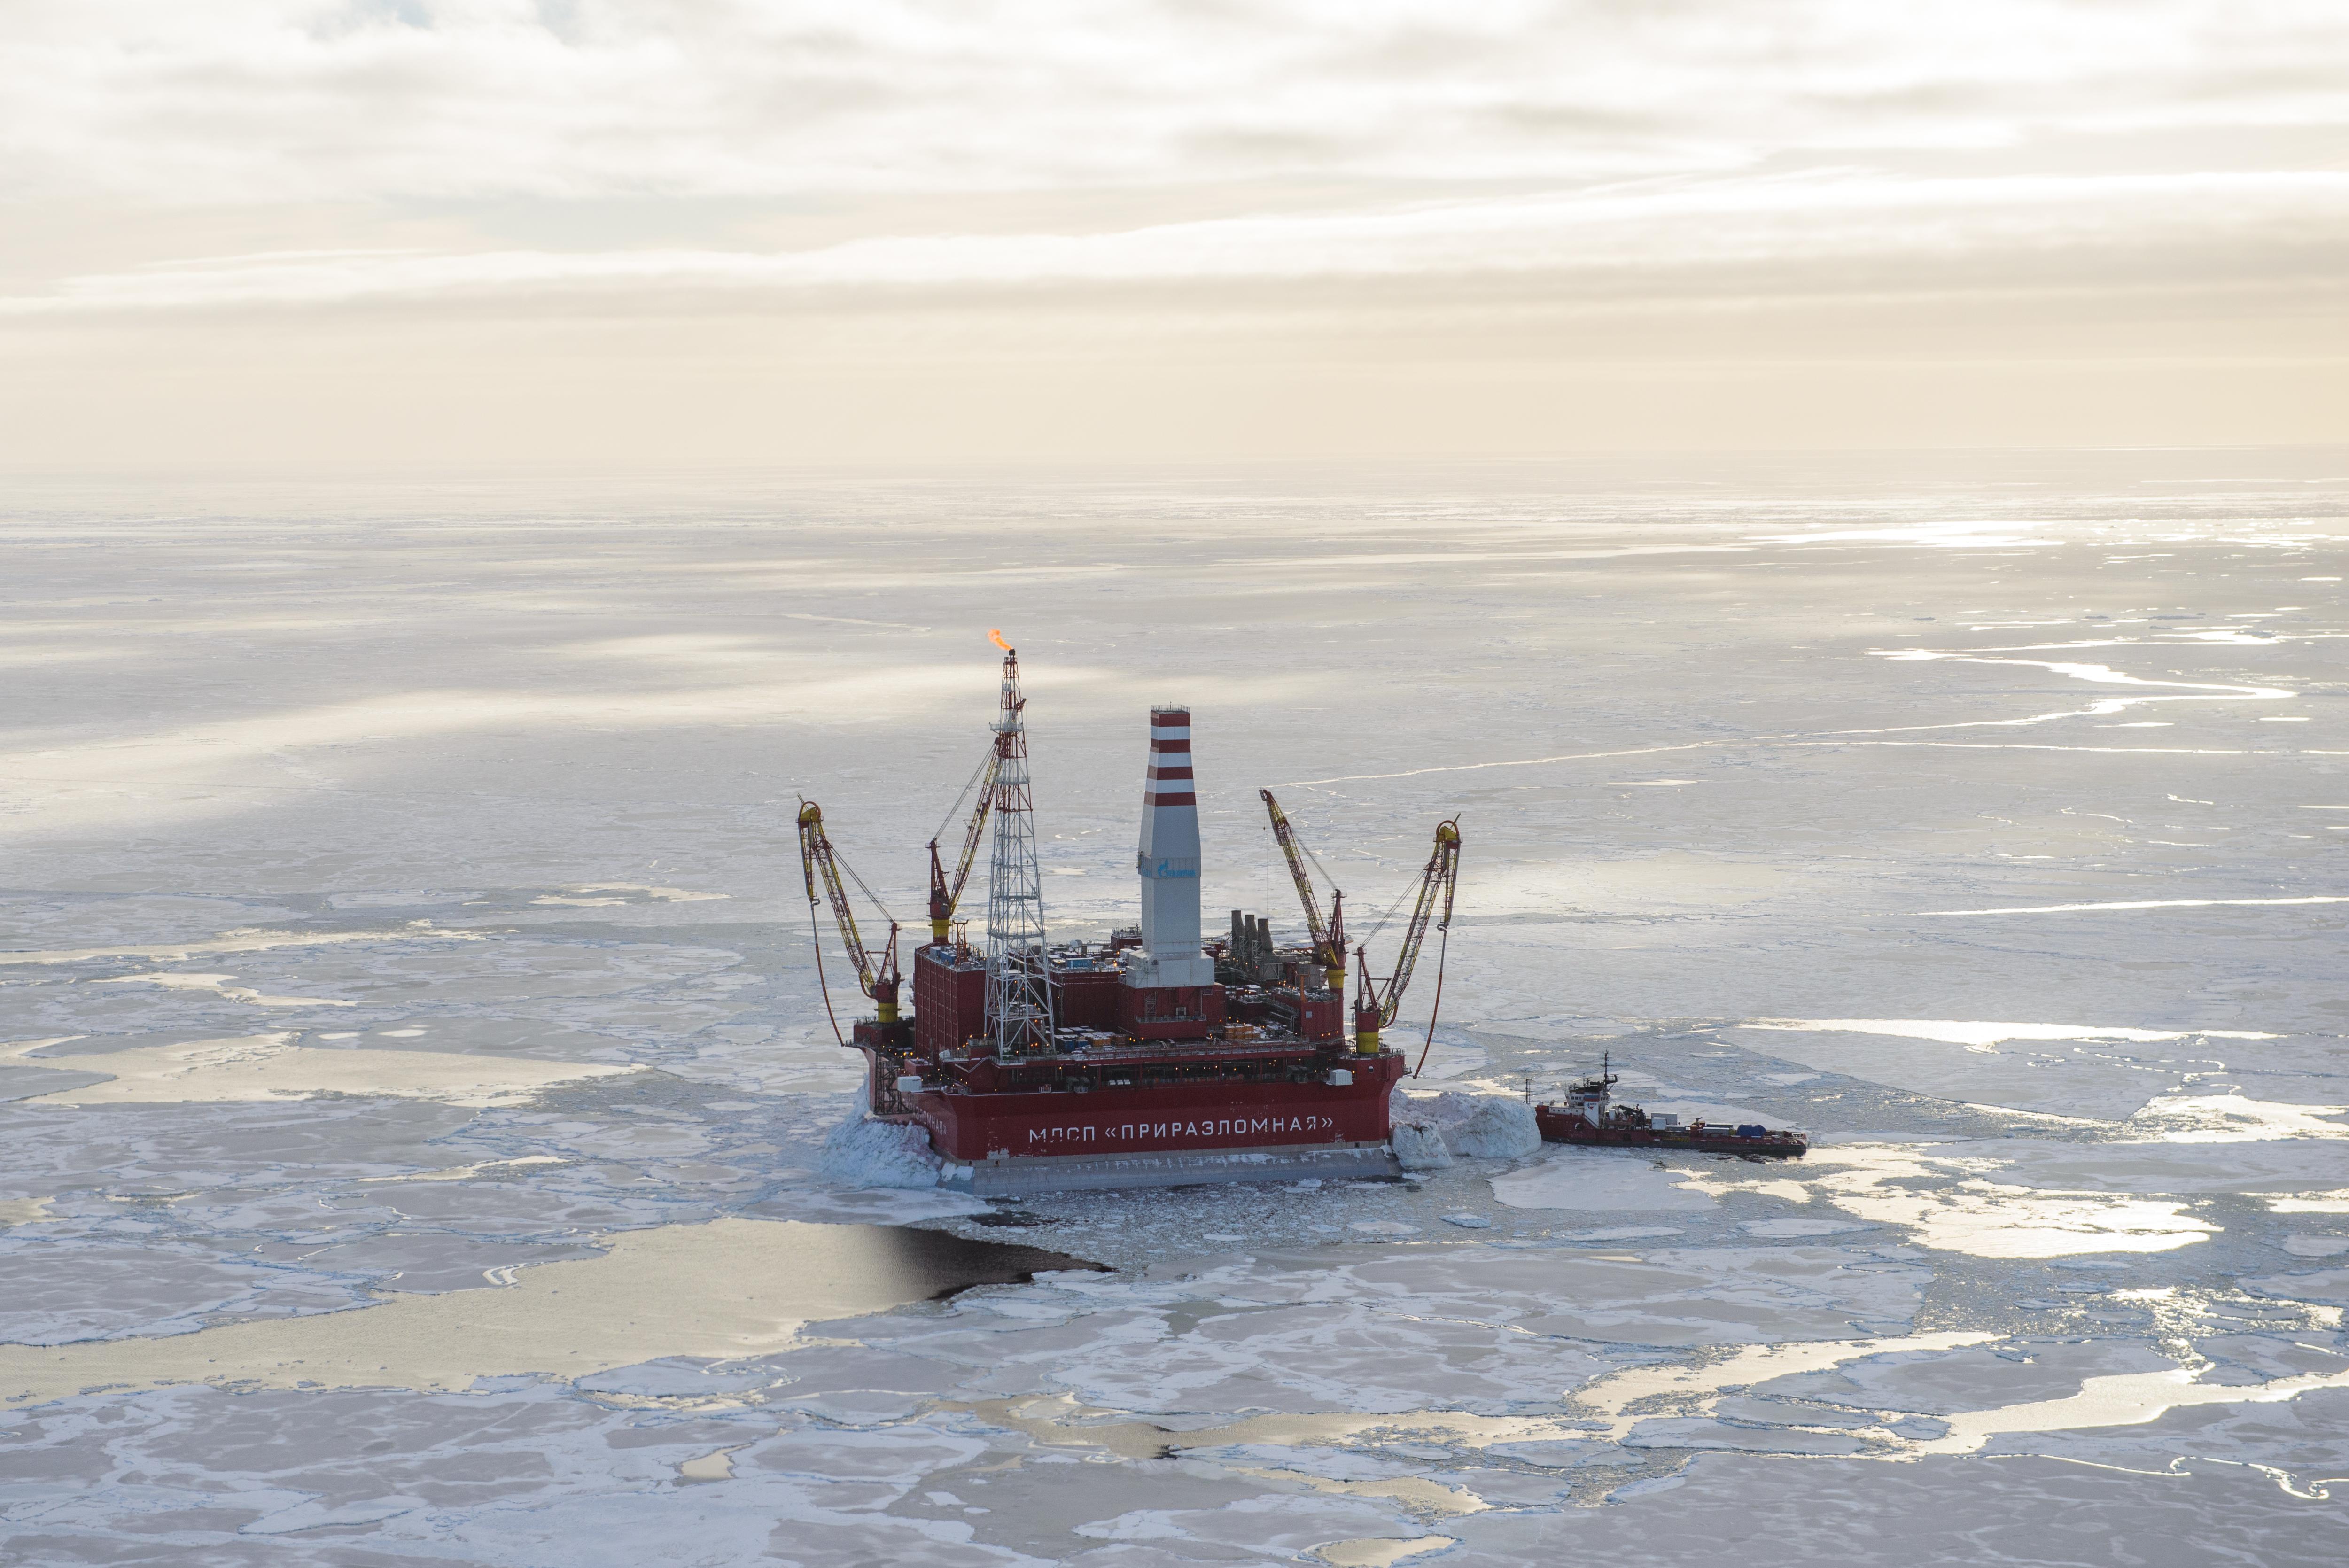 Russia's offshore Arctic platform Prirazlomnaya prepares to double production